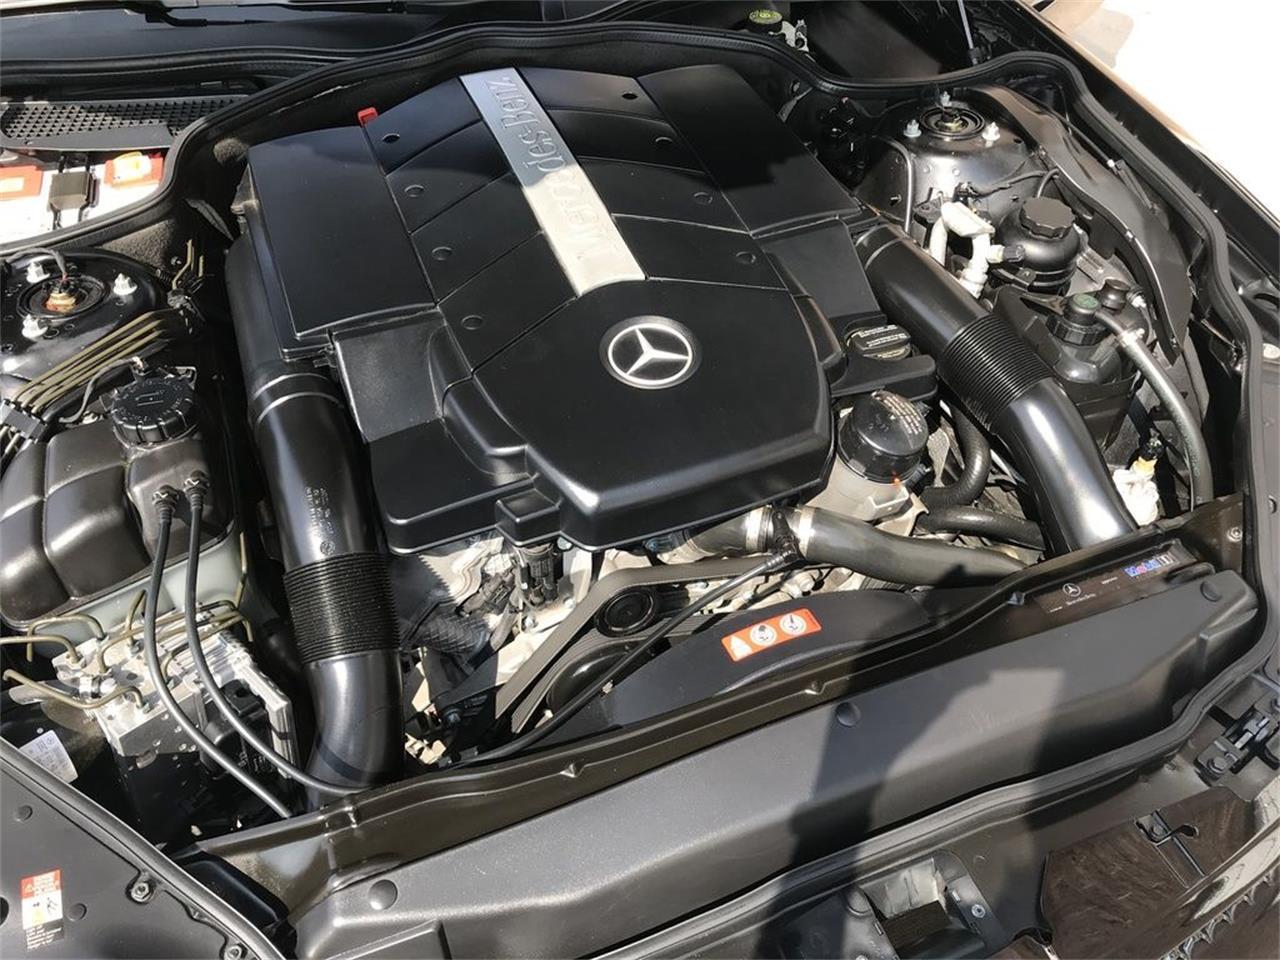 2006 Mercedes-Benz SL-Class (CC-1414903) for sale in Henderson, Nevada